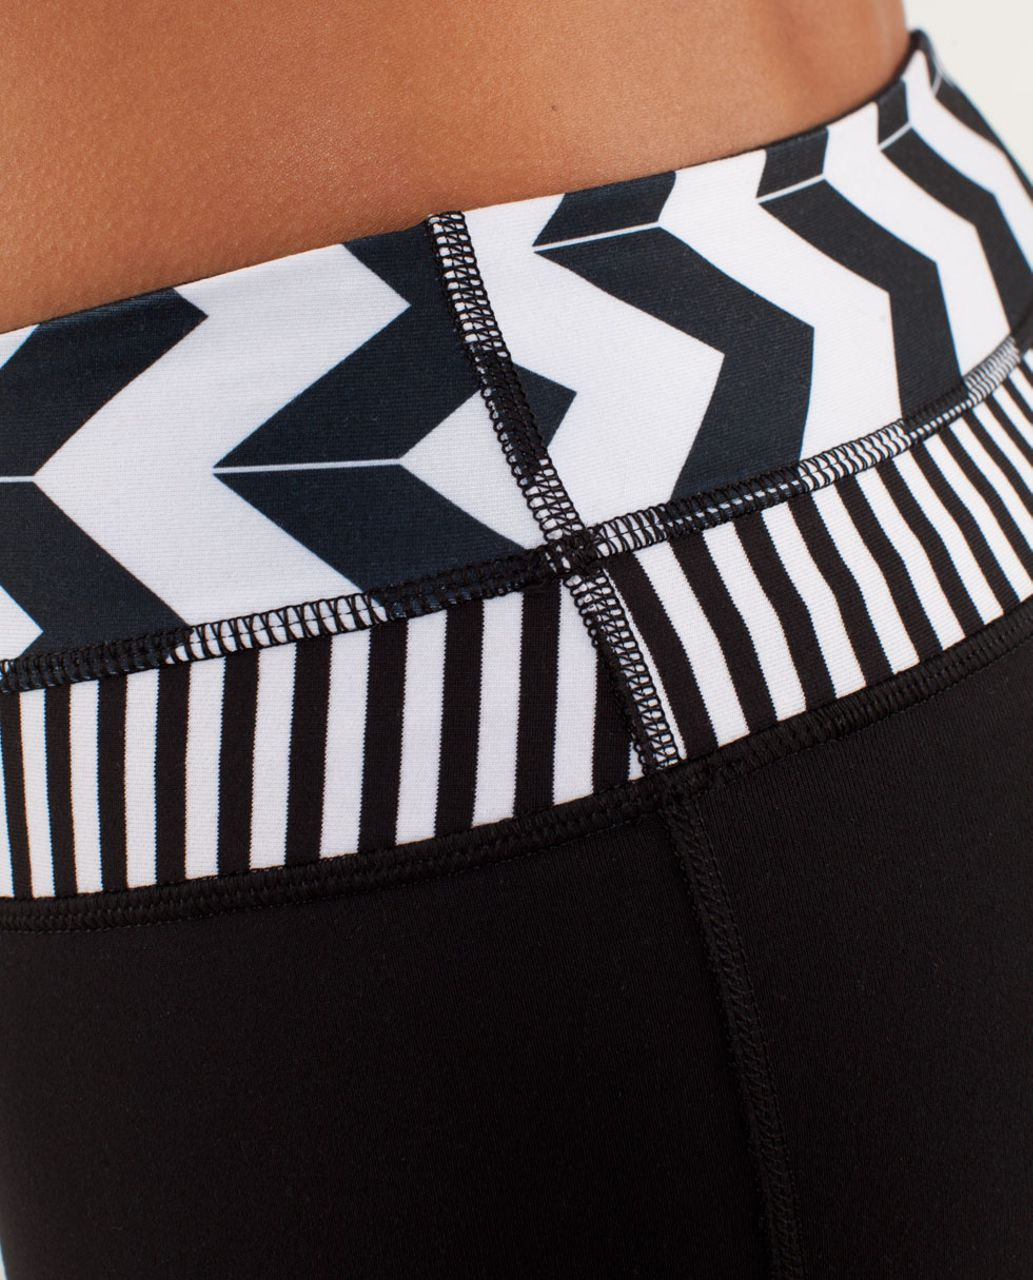 Lululemon Groove Pant *Slim (Regular) - Black / Arrow Chevron White Black / Classic Stripe Black And White